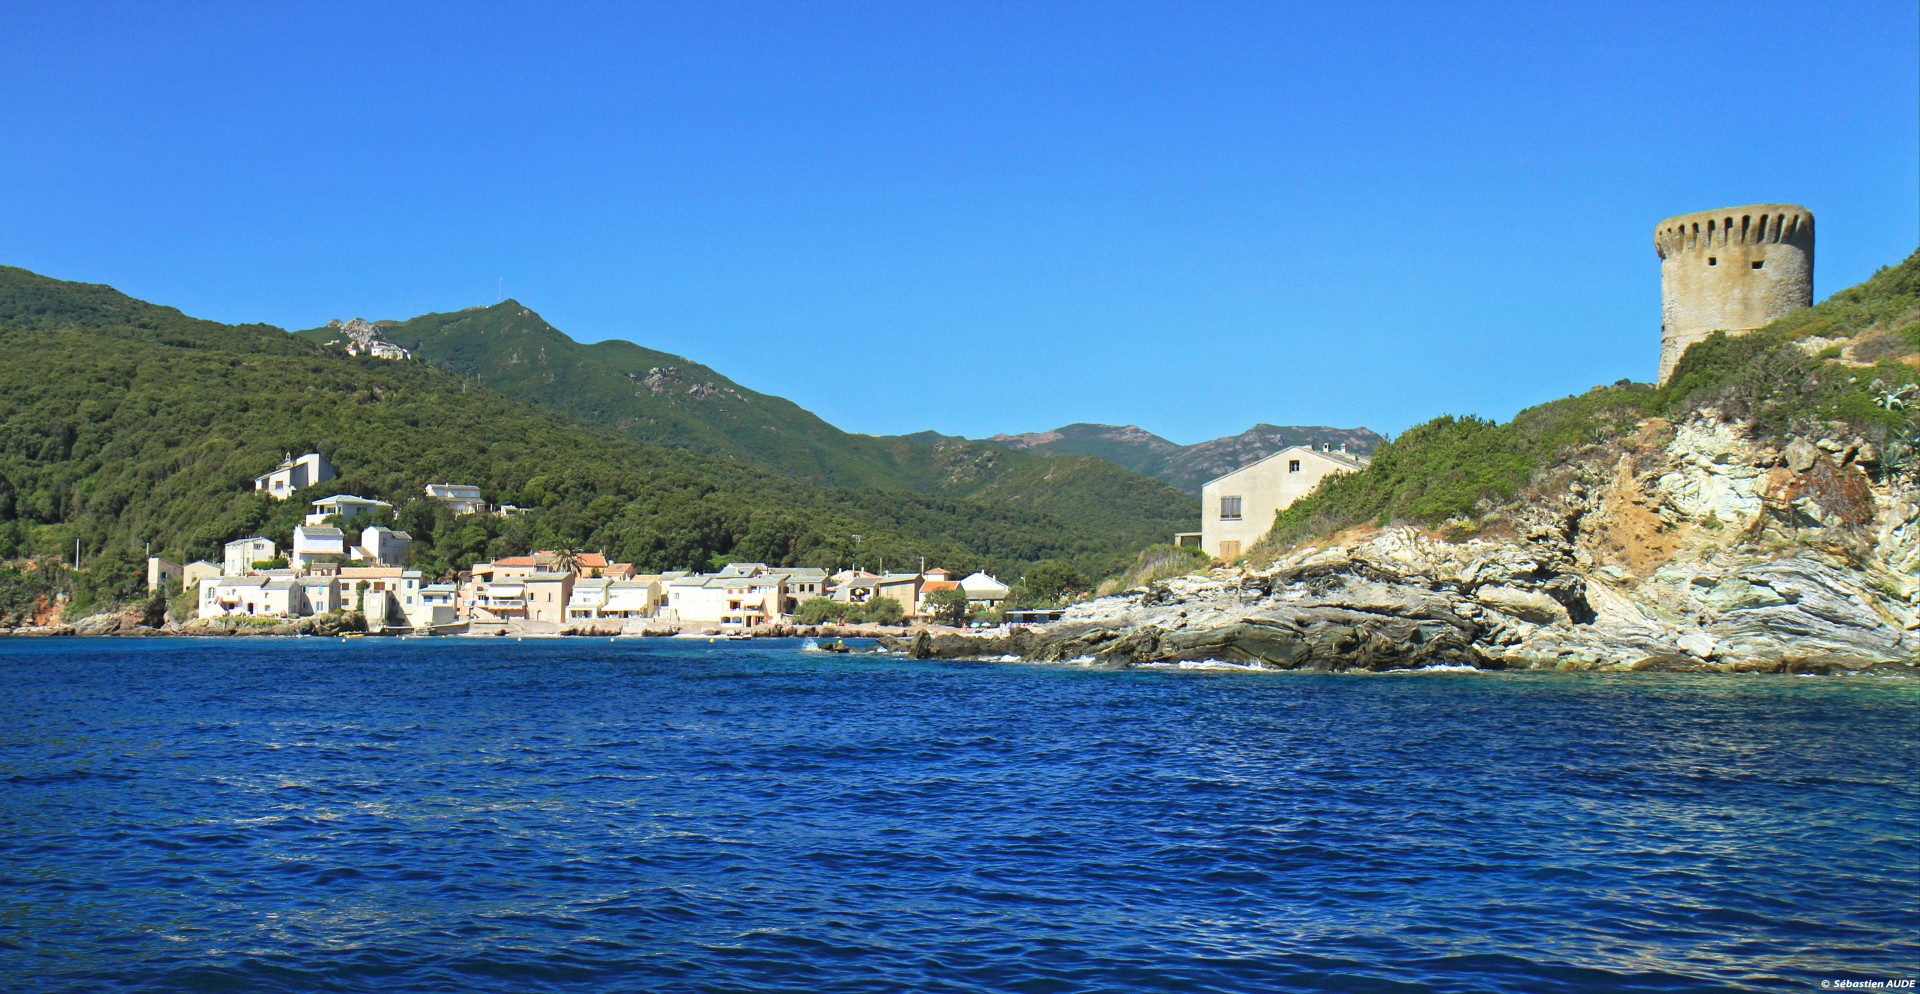 Plage de Meria - Cap Corse Capicorsu